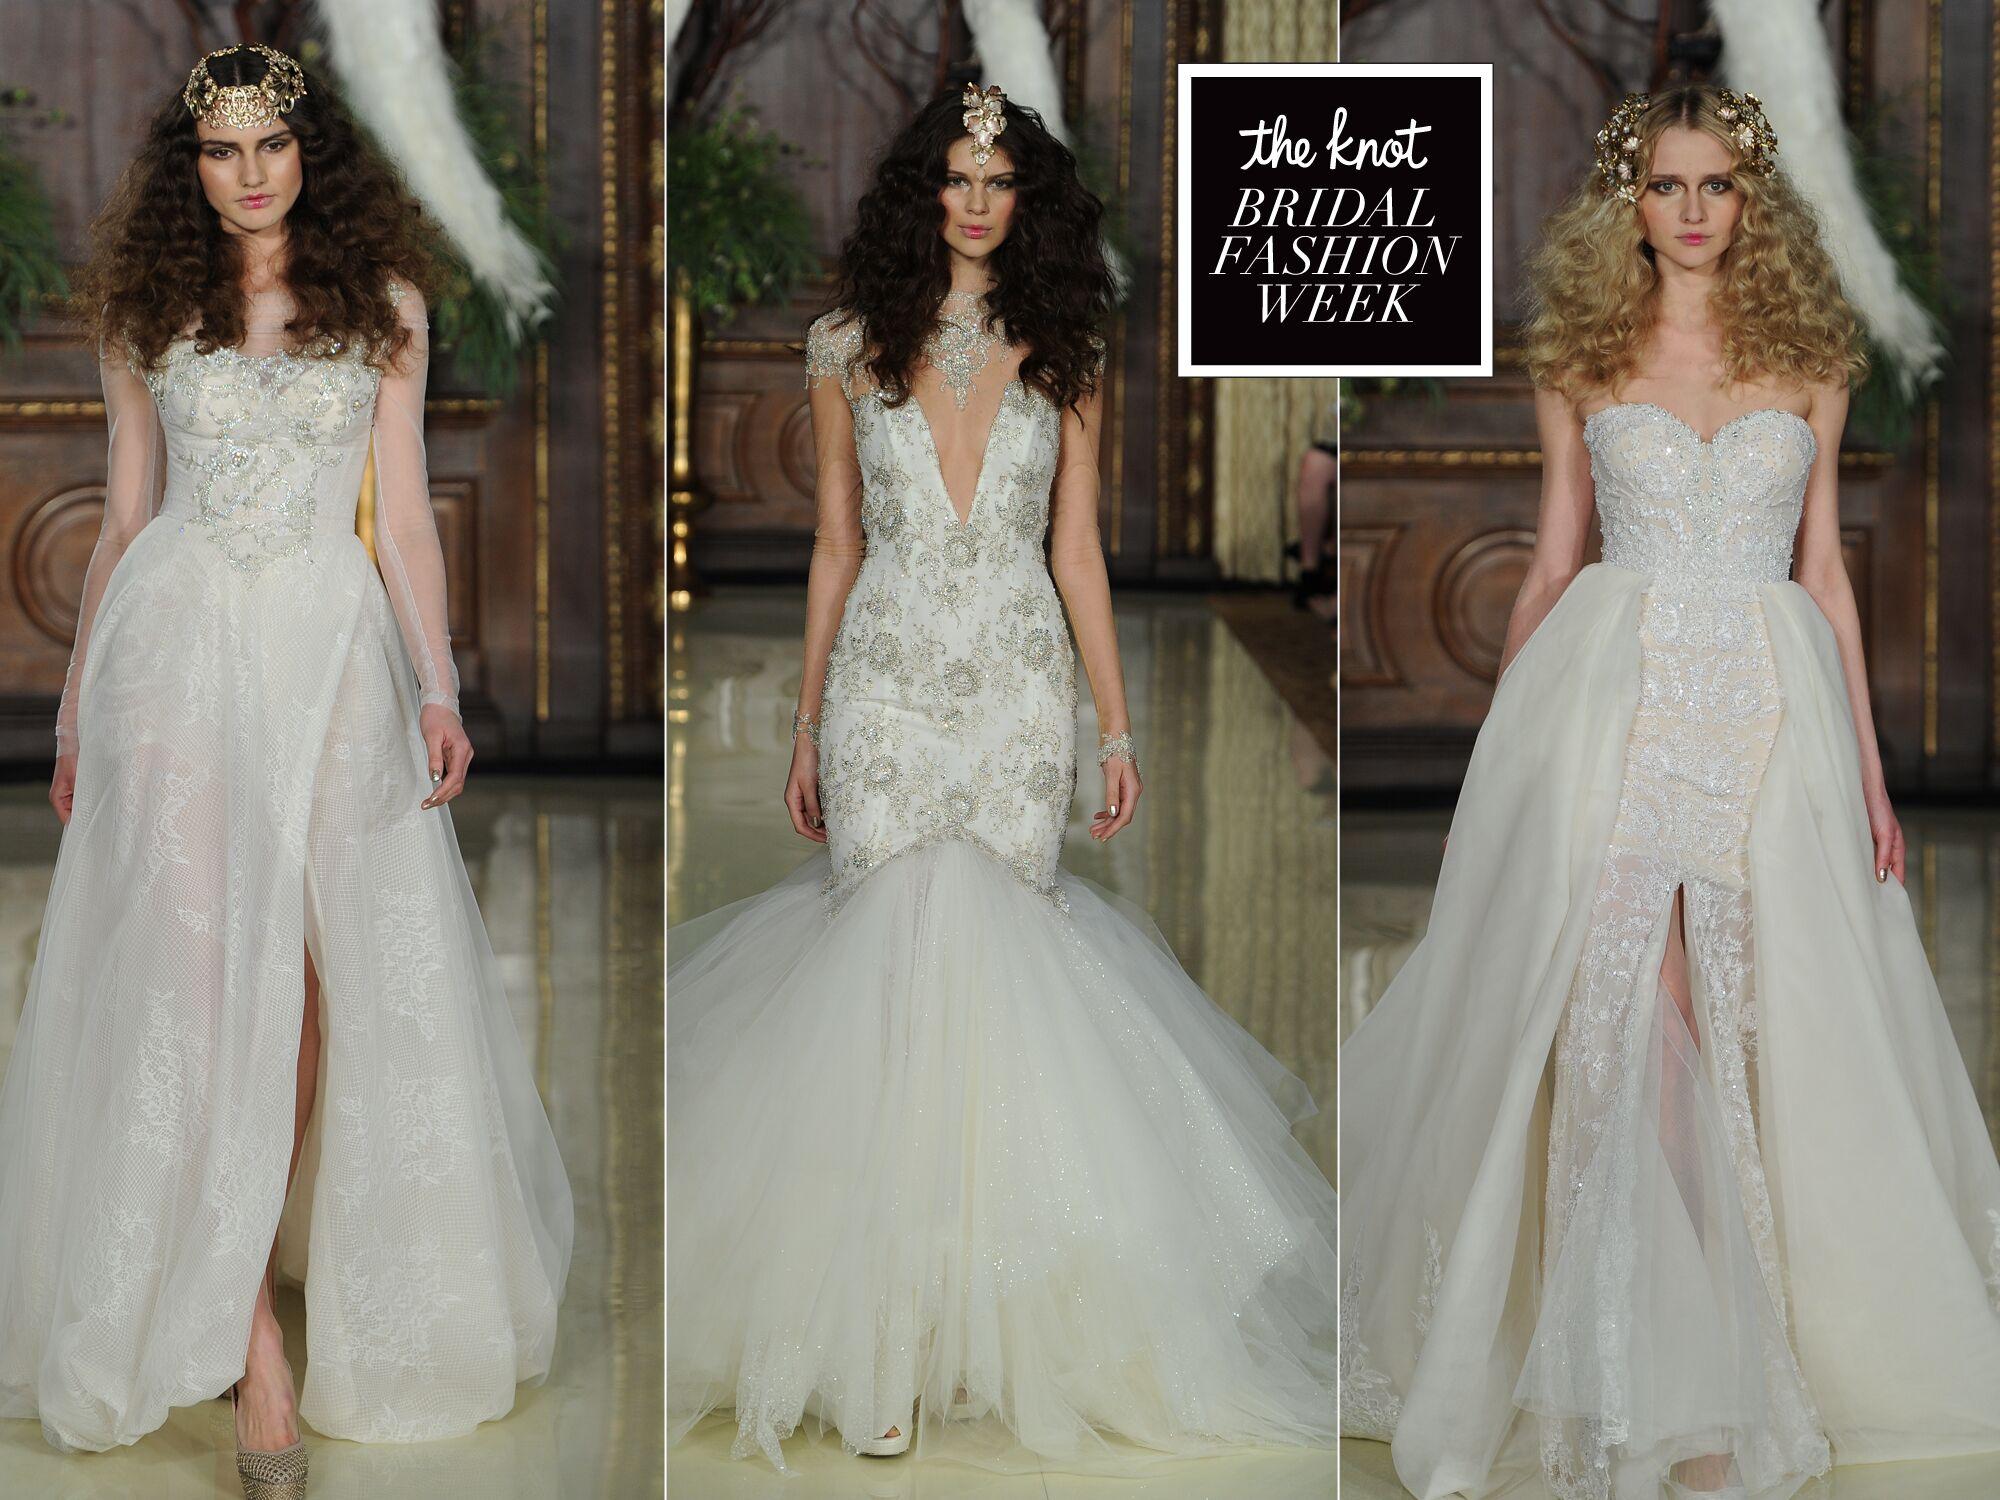 Wedding Gowns 2016: Galia Lahav Wedding Dresses Straight From Bridal Fashion Week